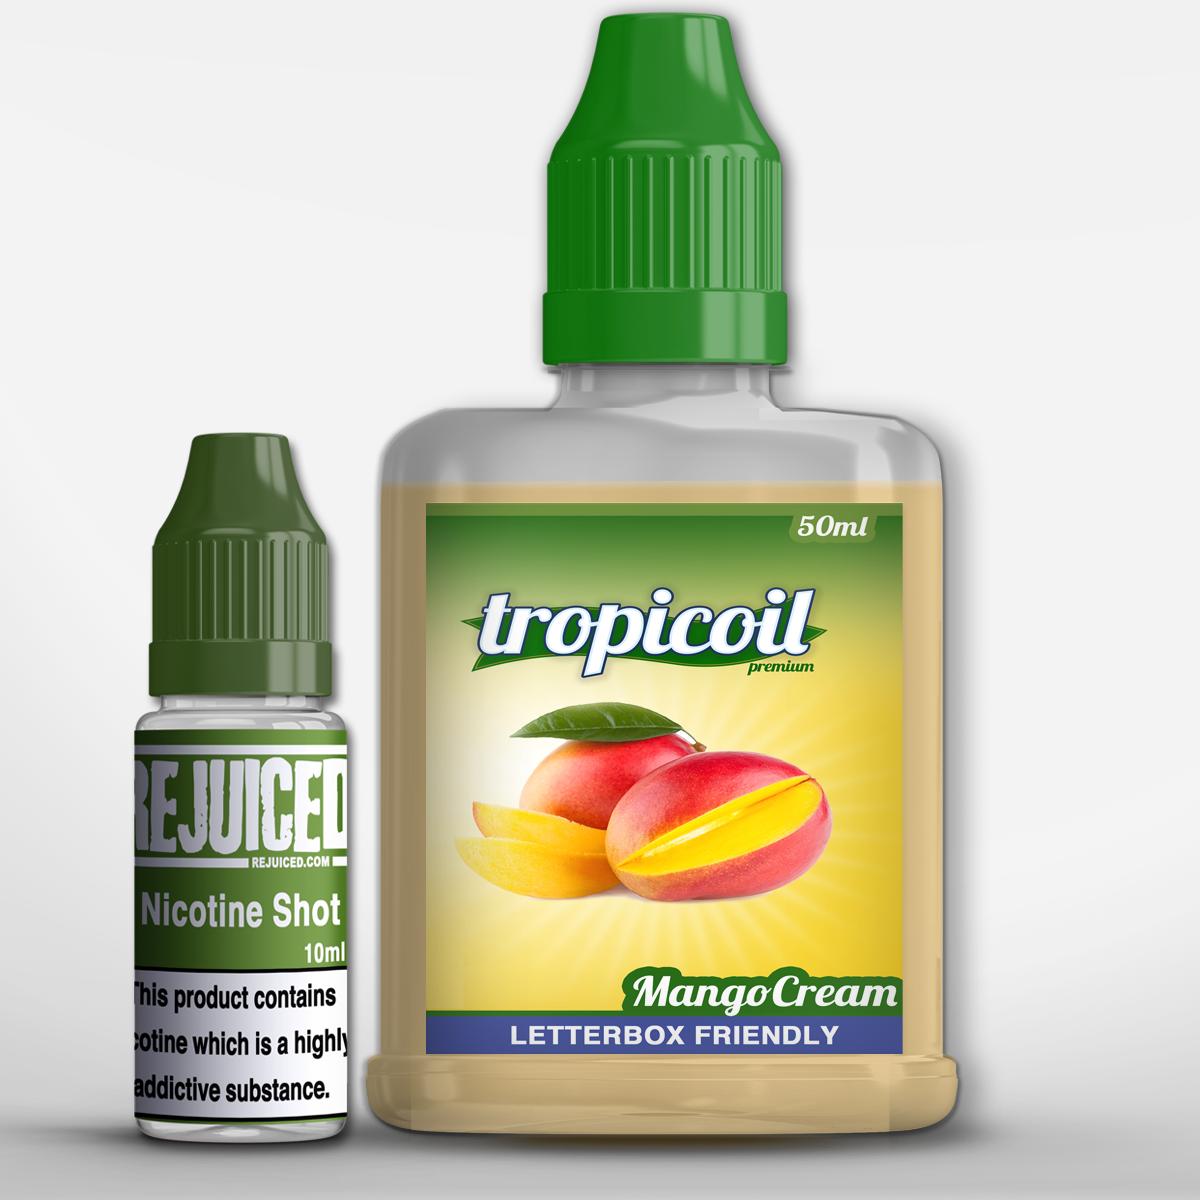 Mango Cream - 50ml Shortfill - Tropicoil